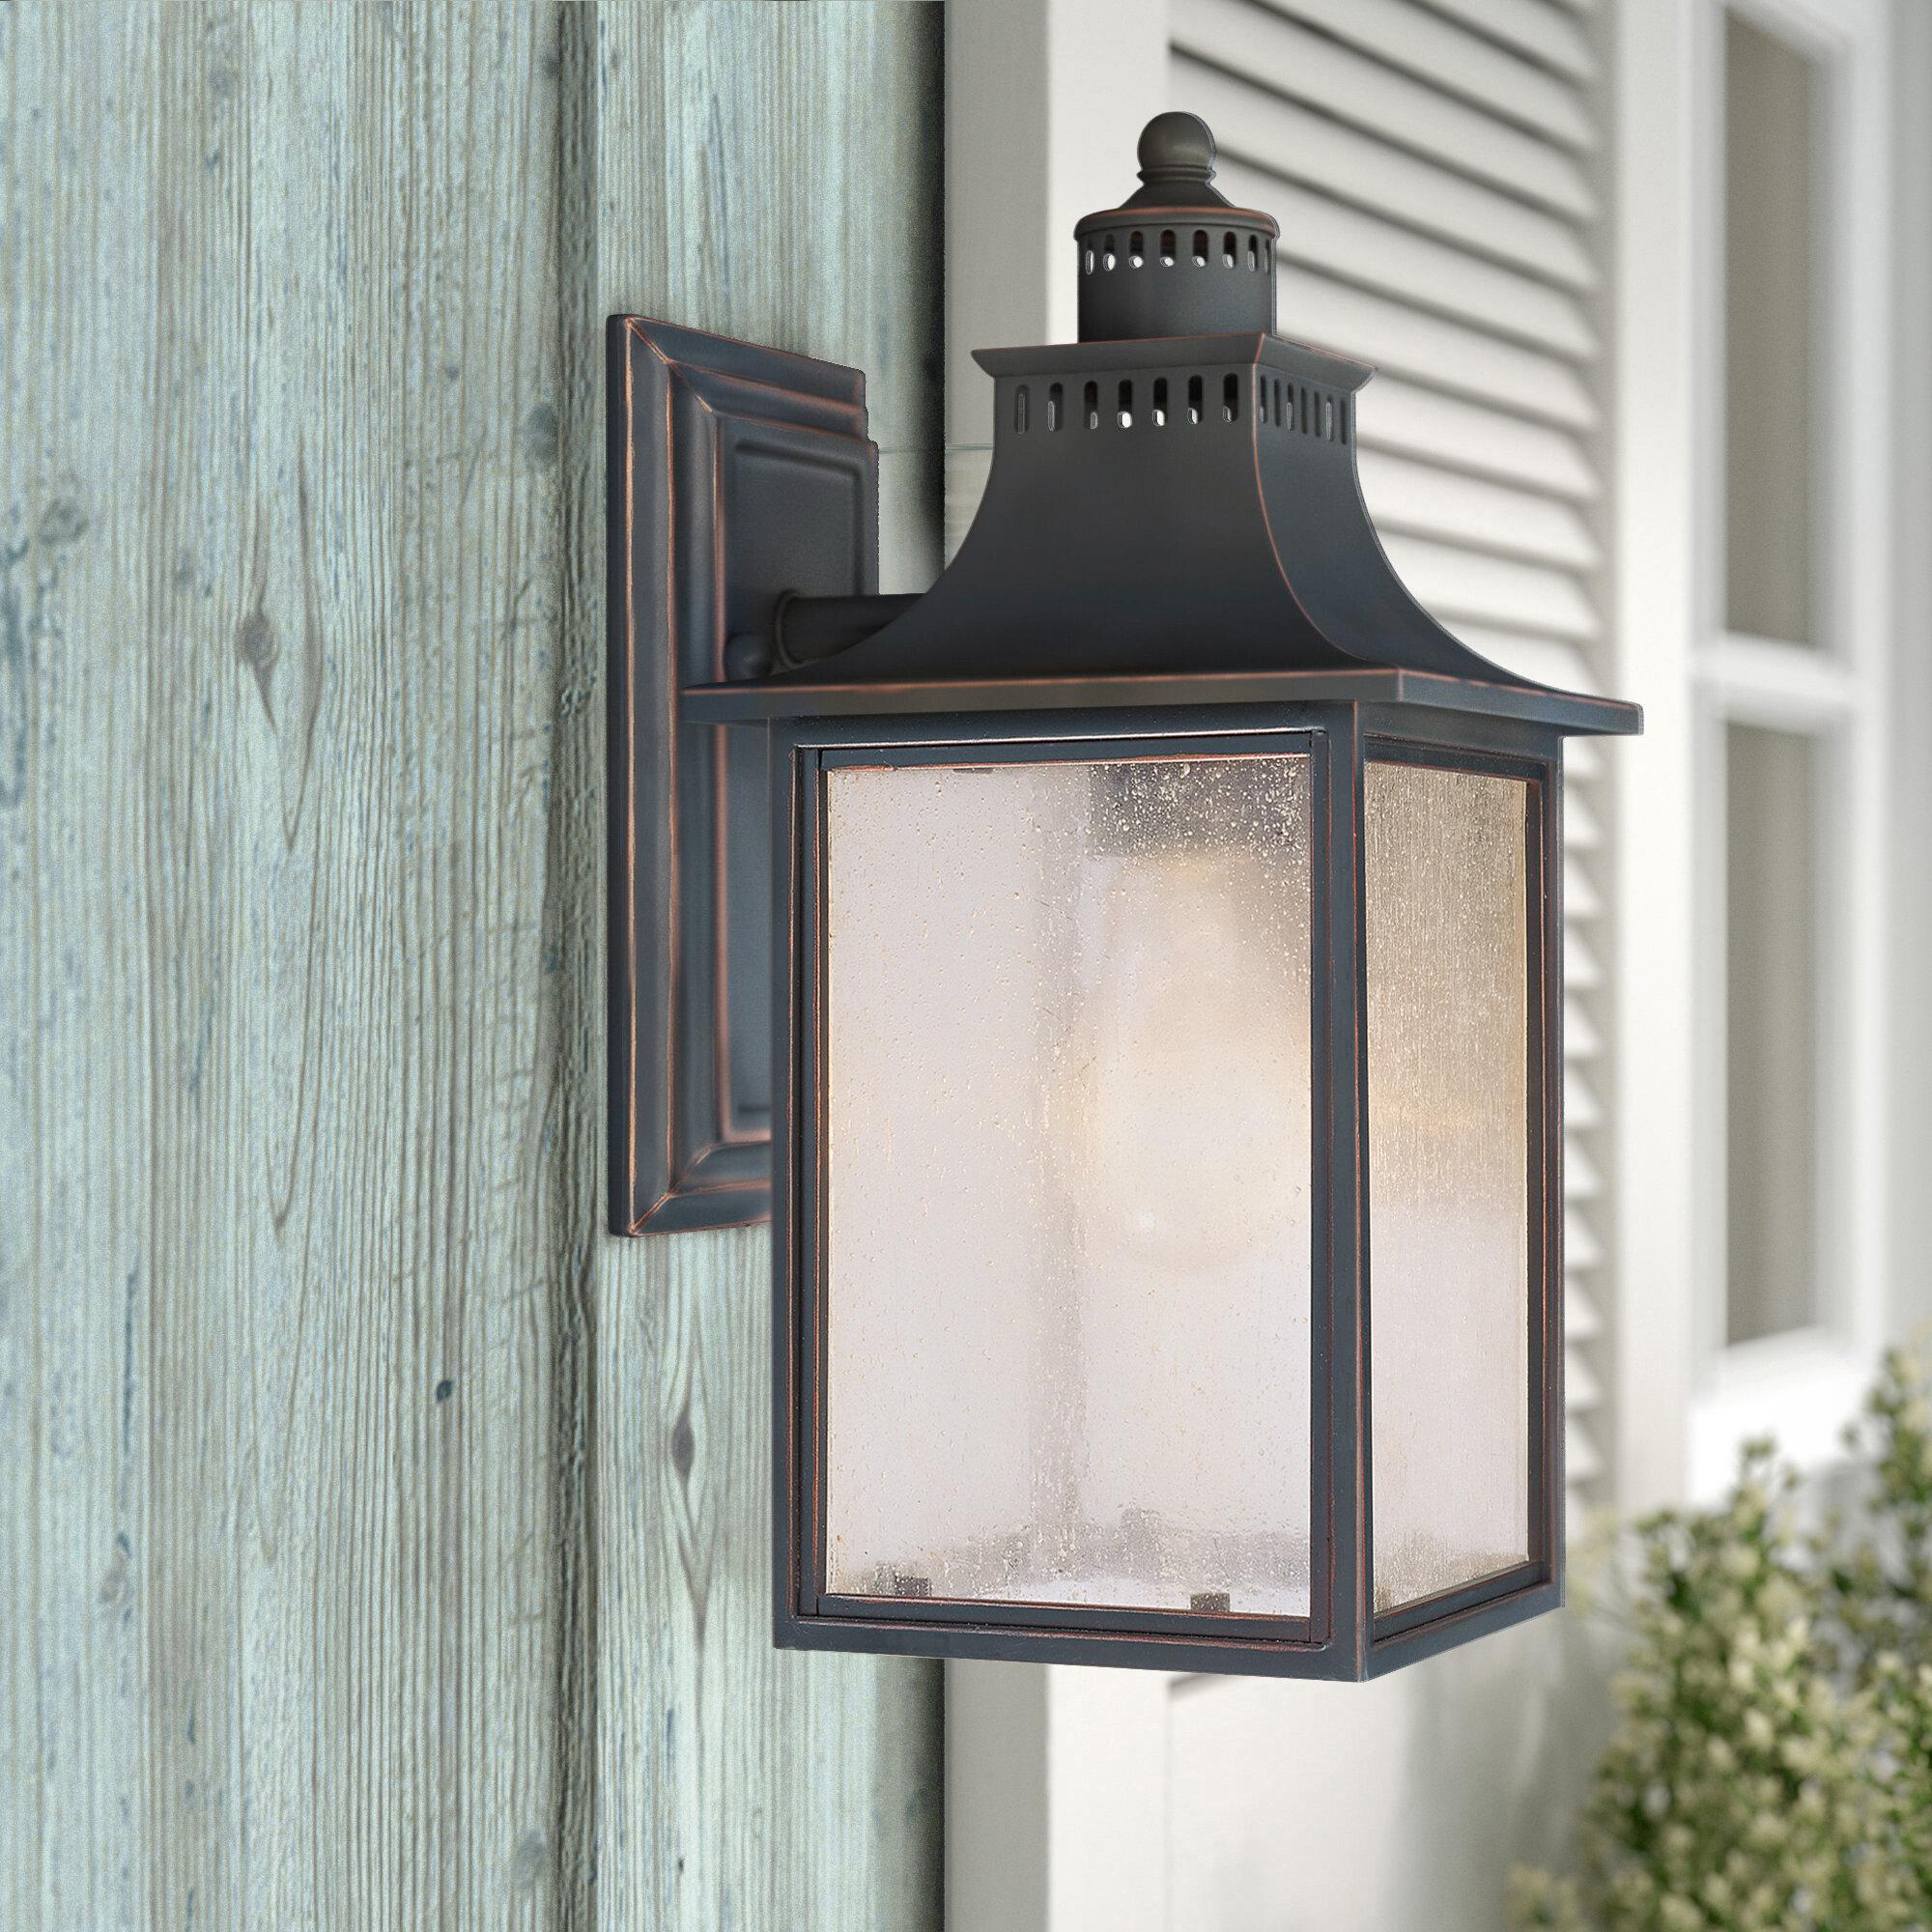 Laurel Foundry Modern Farmhouse Deshawn 1 Light Outdoor Wall Lantern Reviews Wayfair Ca